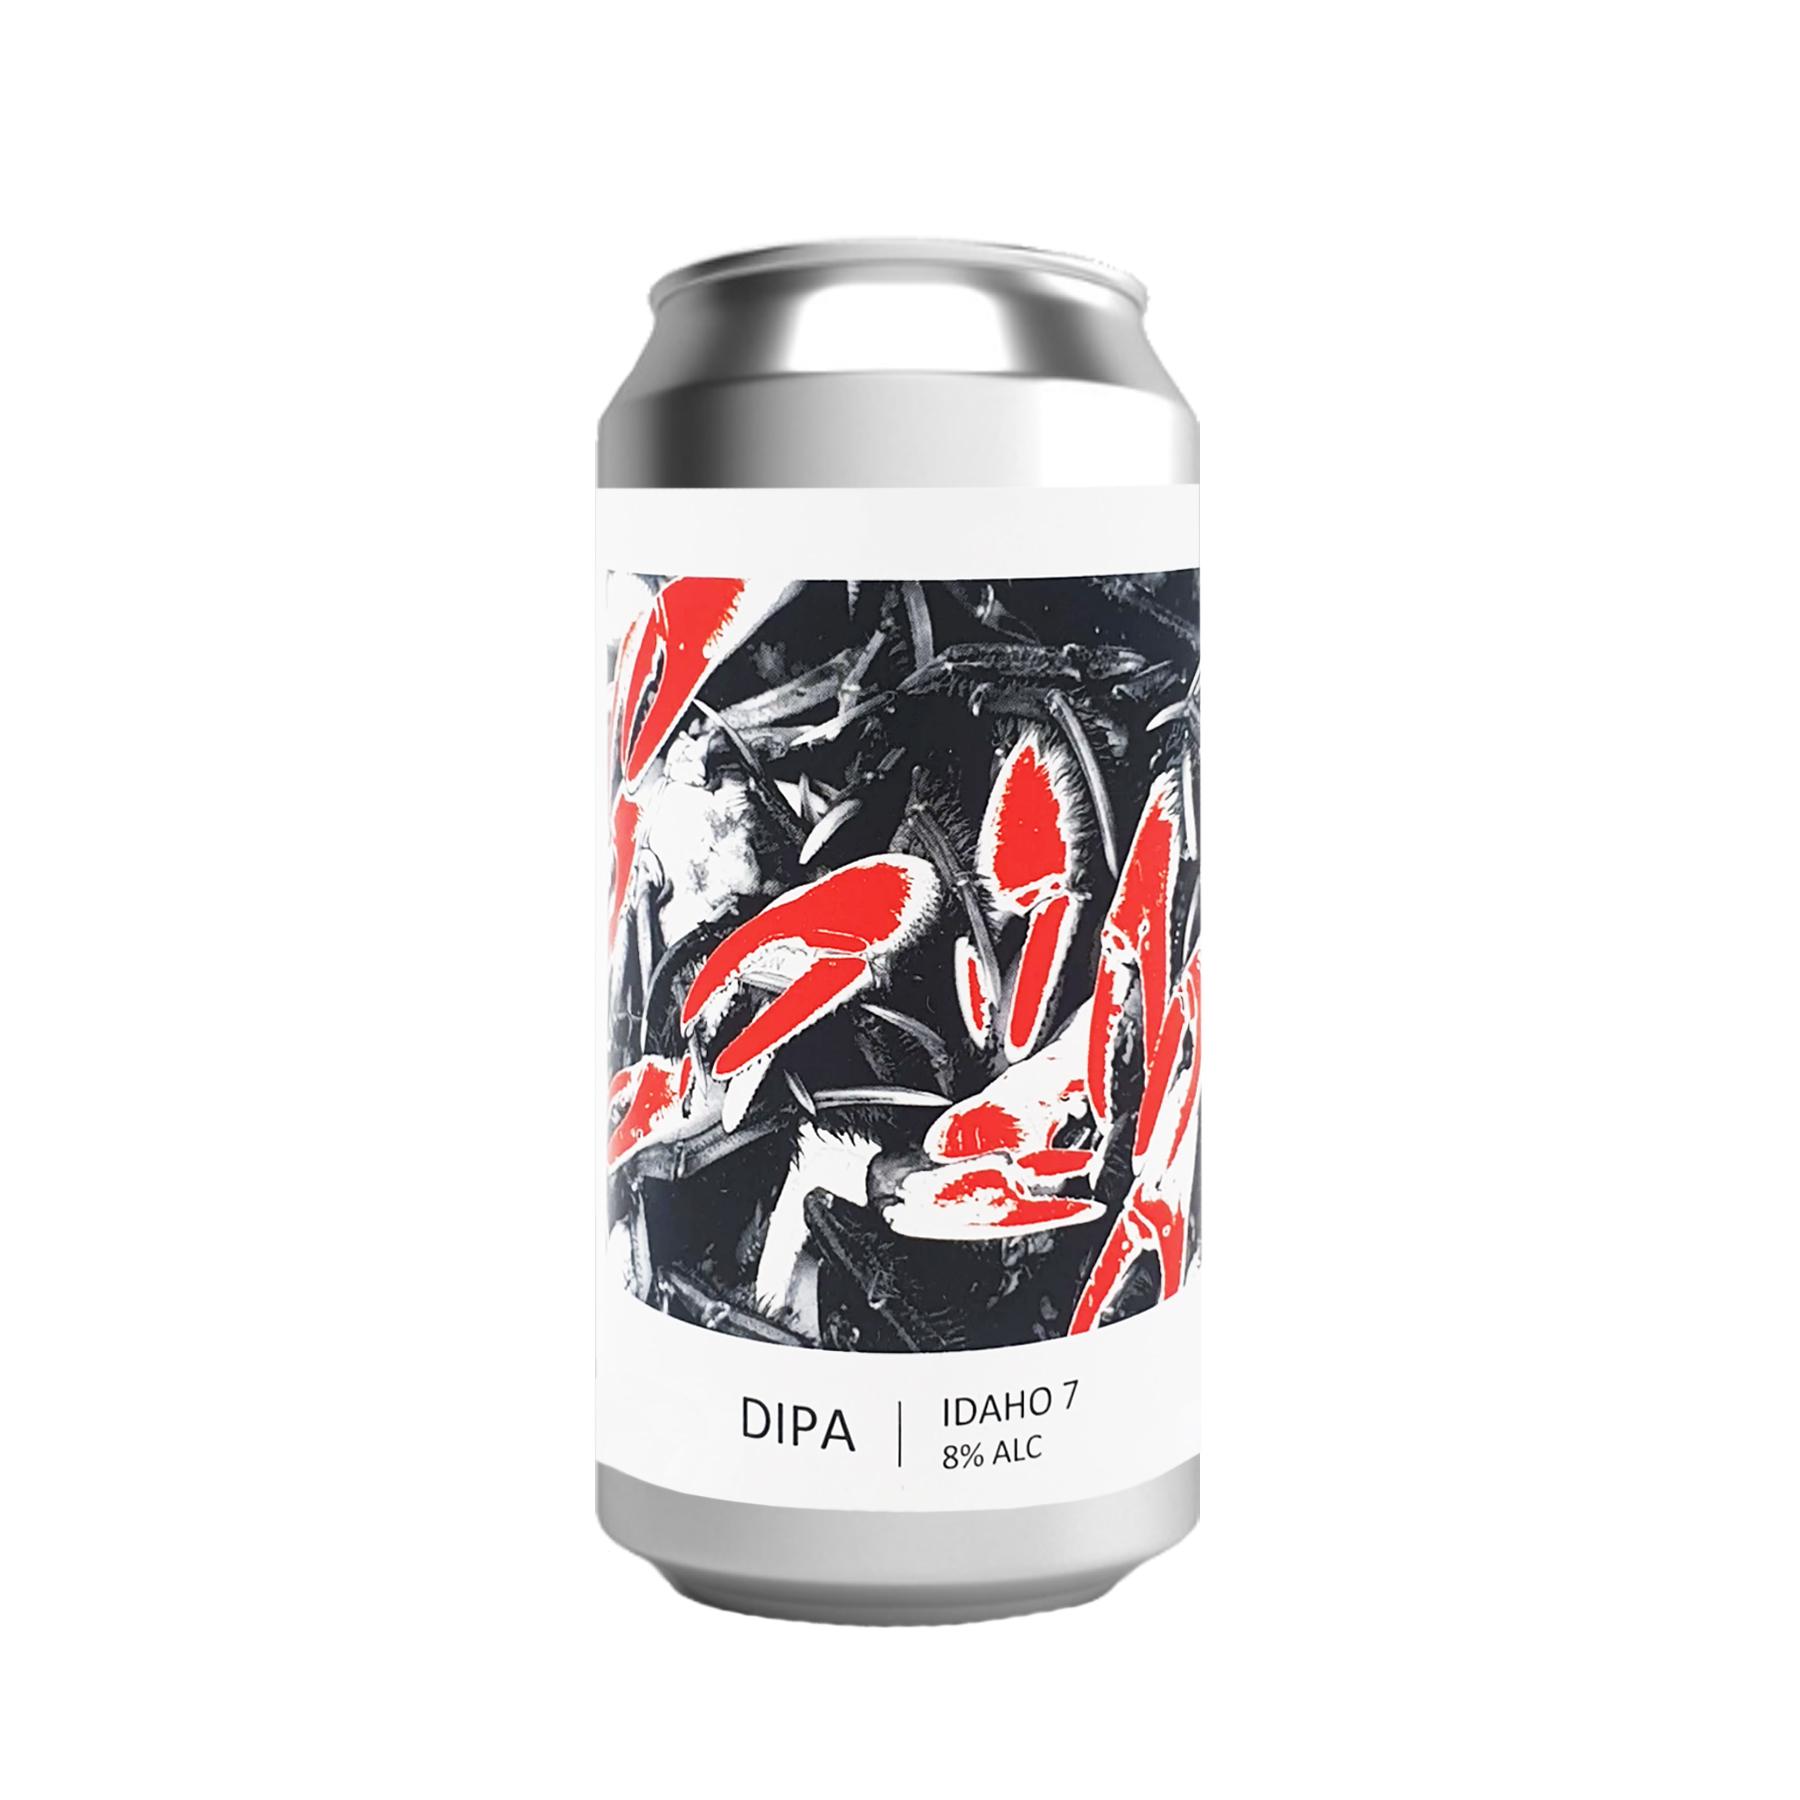 Bière DIPA Idaho 7 - Brasserie Popihn